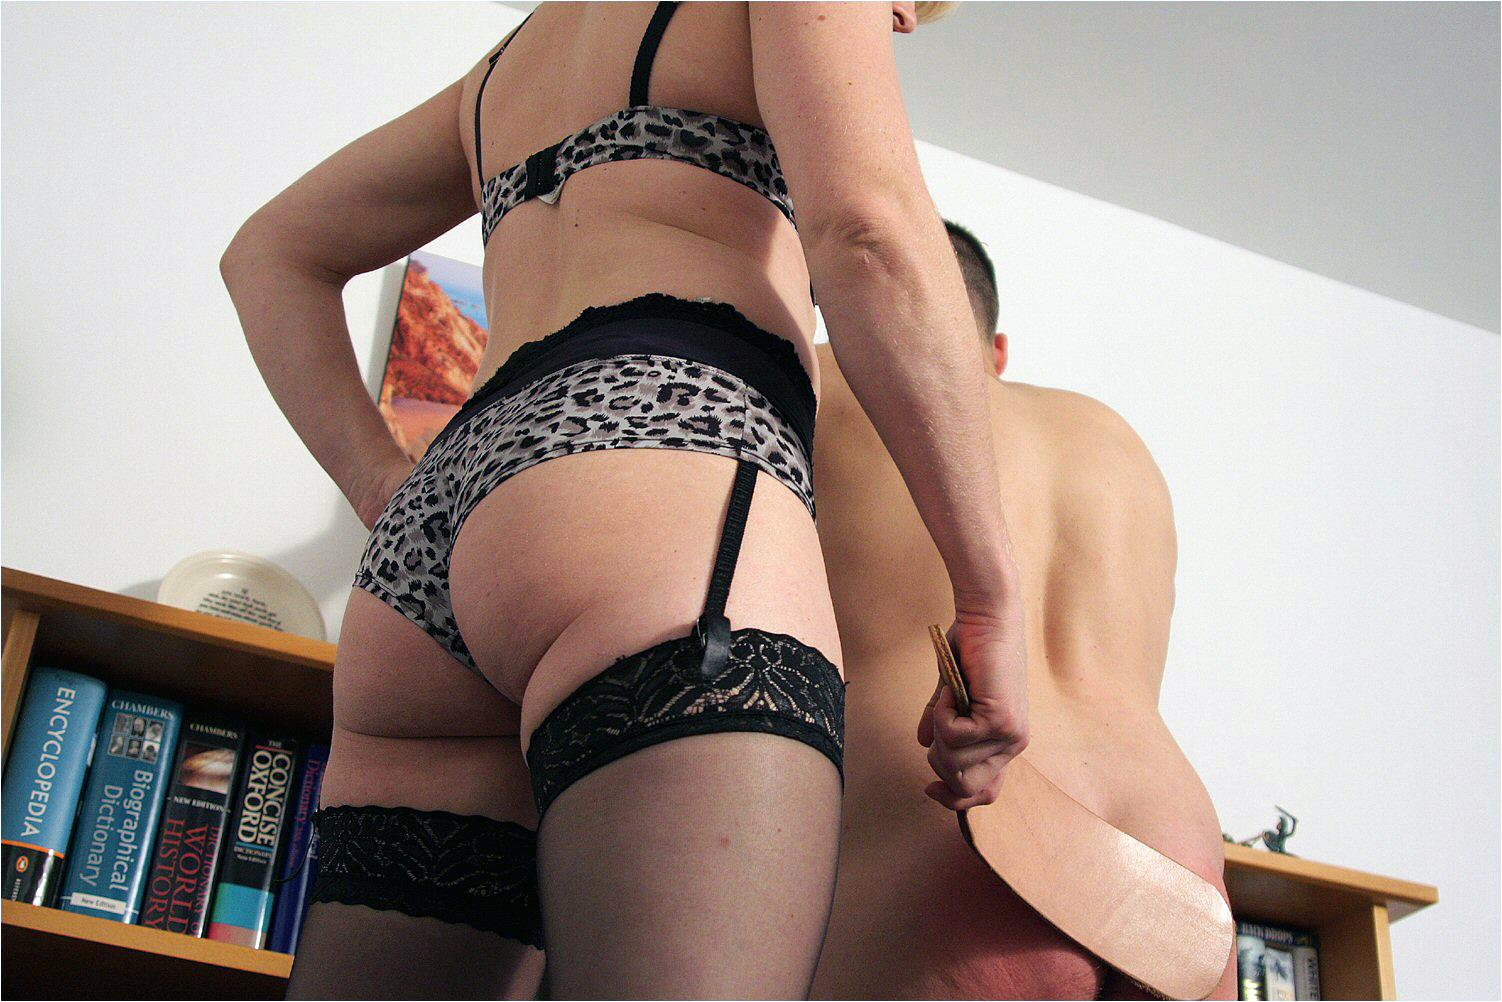 www.linashouseofdiscipline.com women spanking men